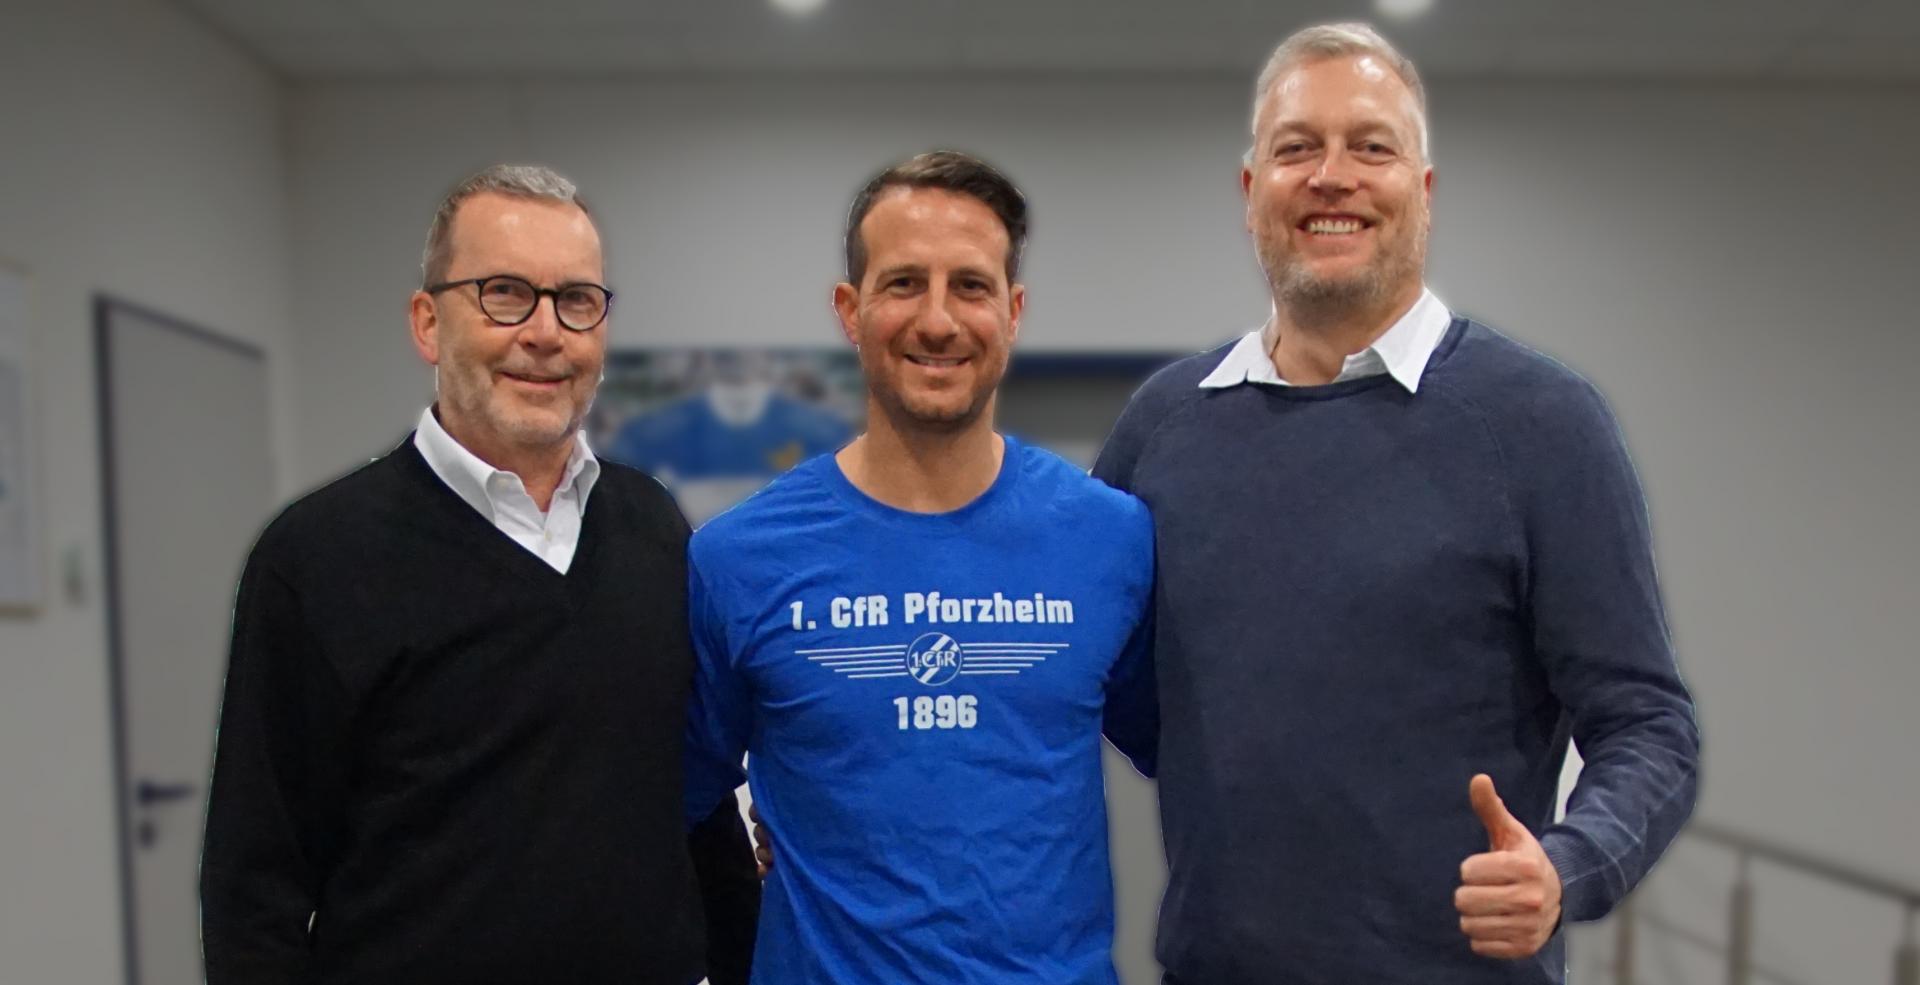 Giuseppe Ricciardi wird neuer Sportdirektor beim 1. CfR